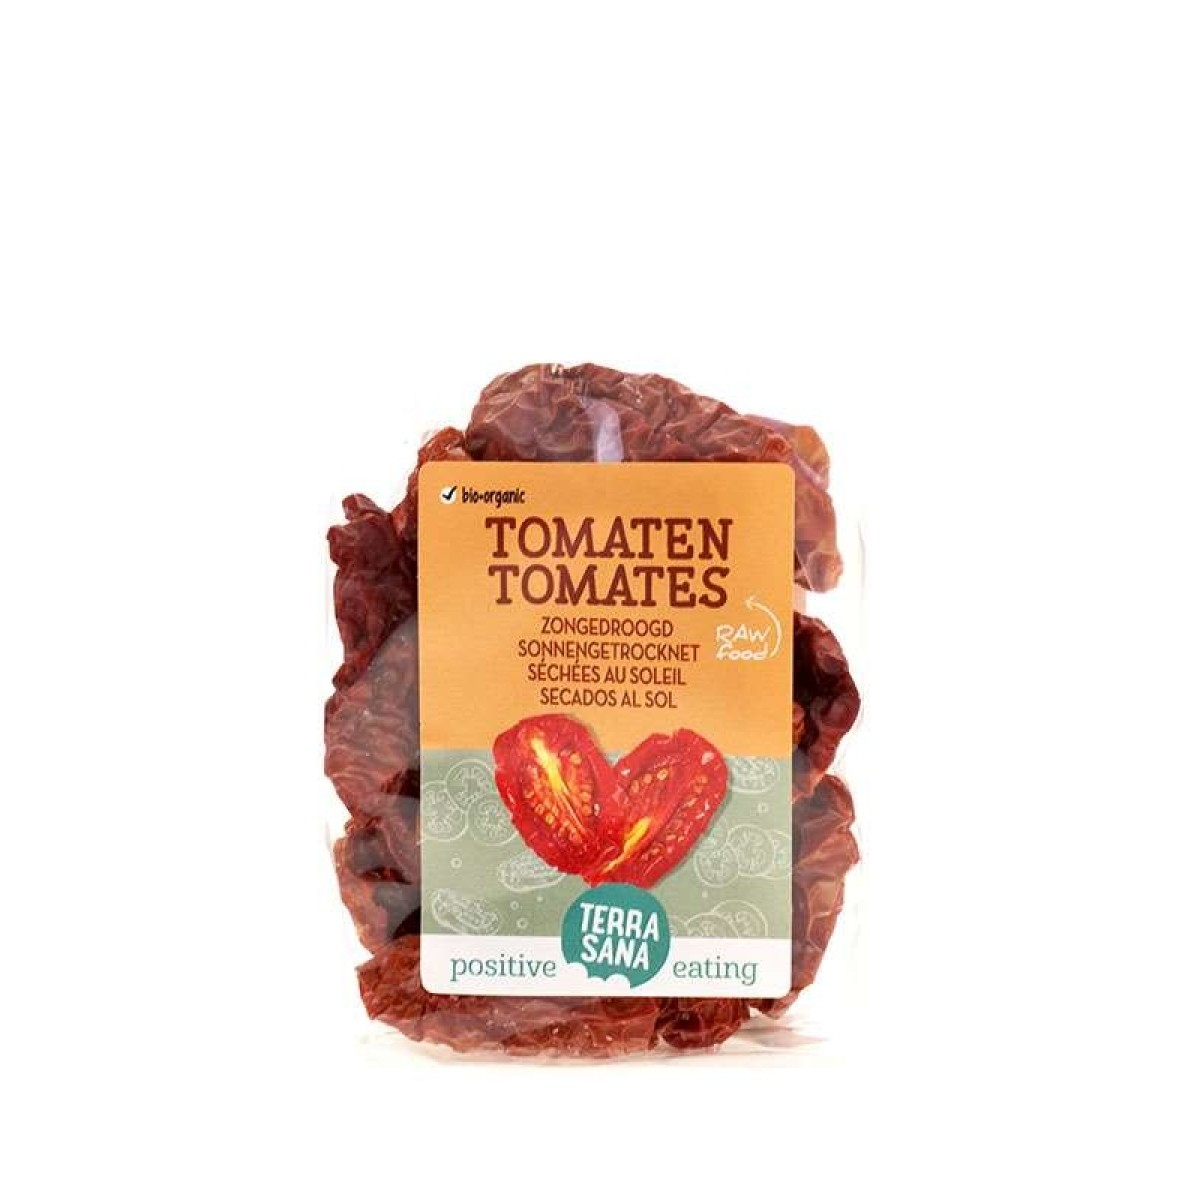 Tomaten Zongedroogd